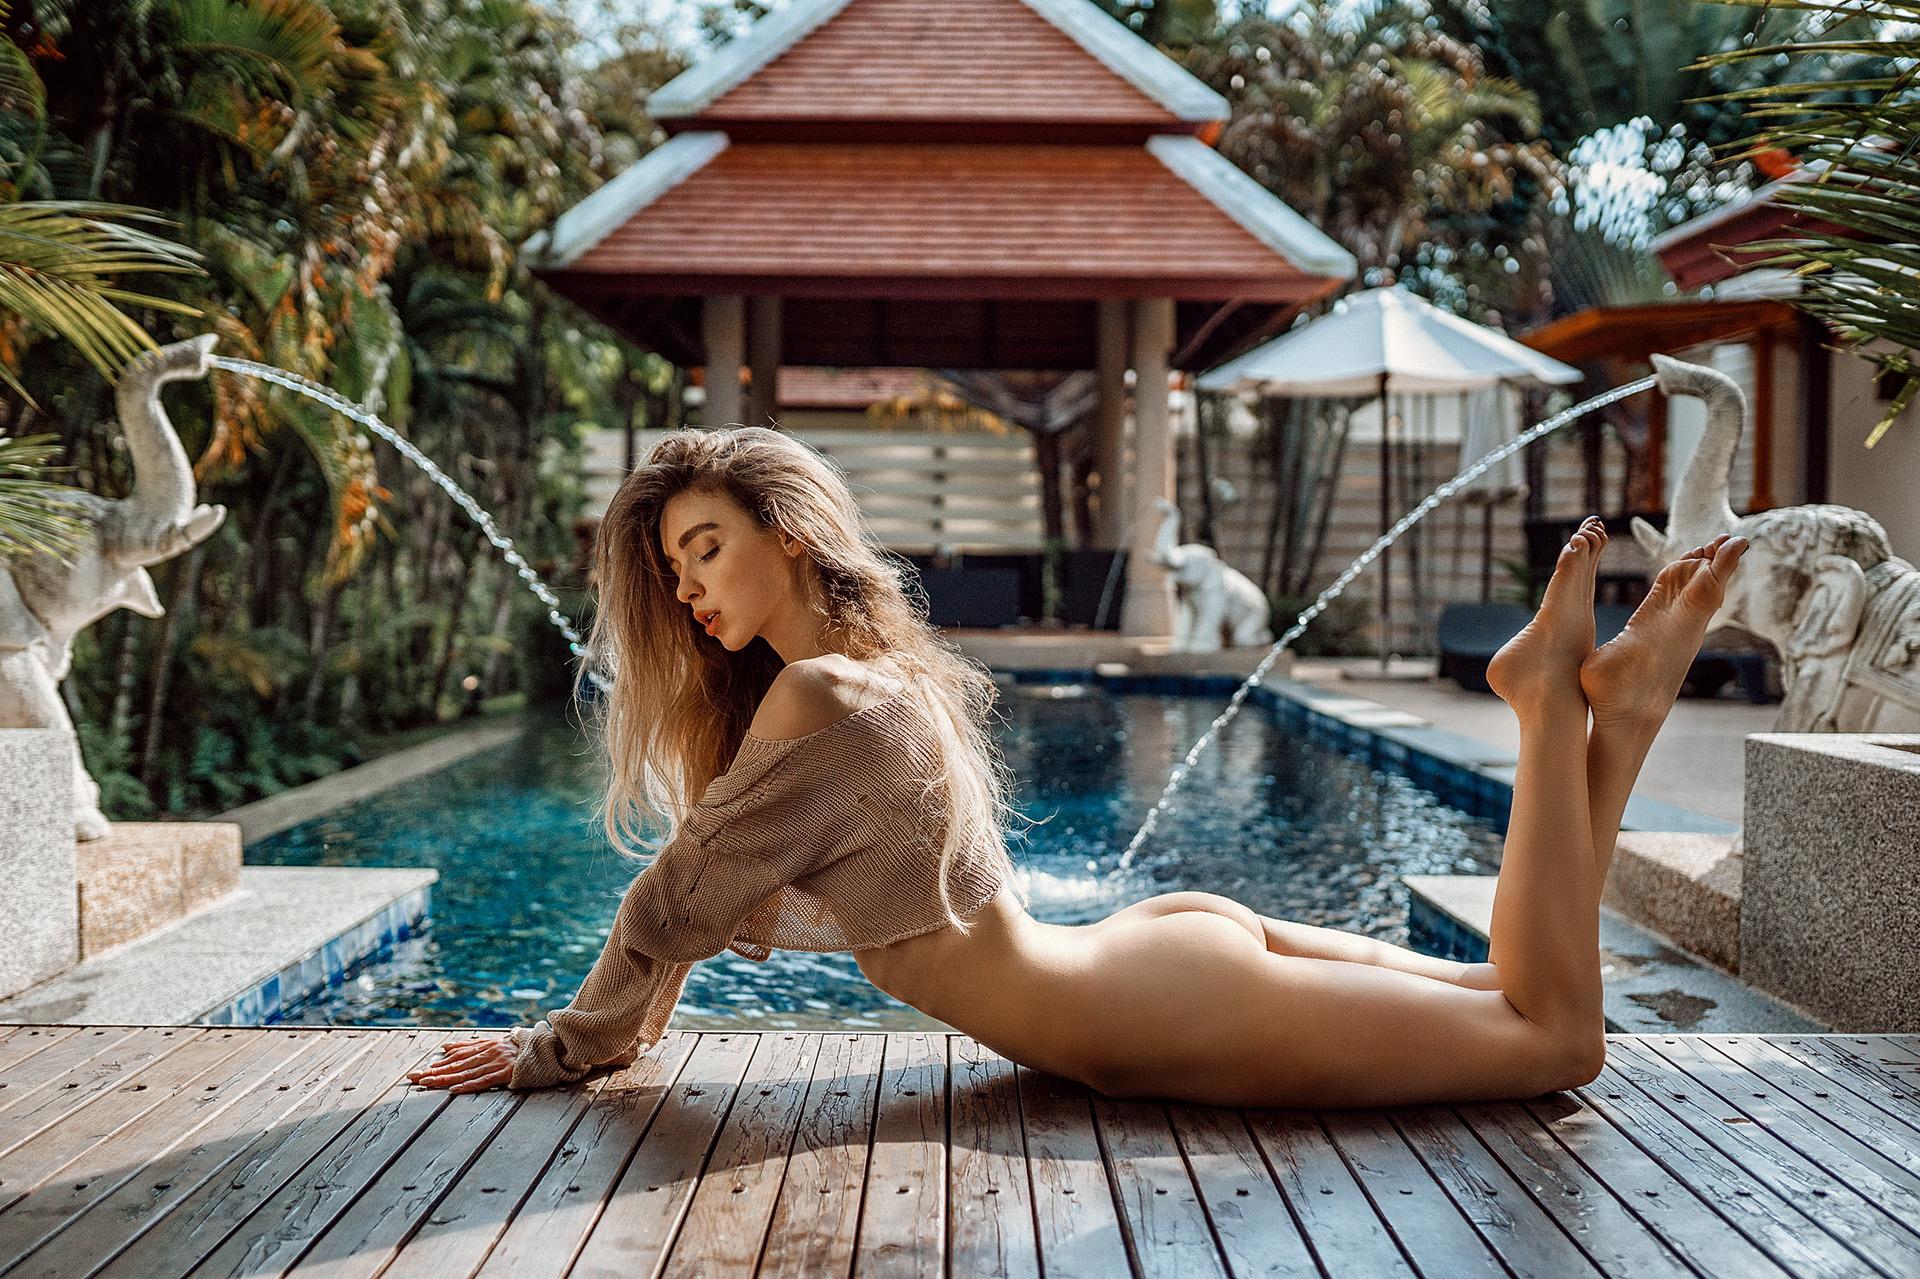 Anna Tsaralunga 3 @tsara.lunga